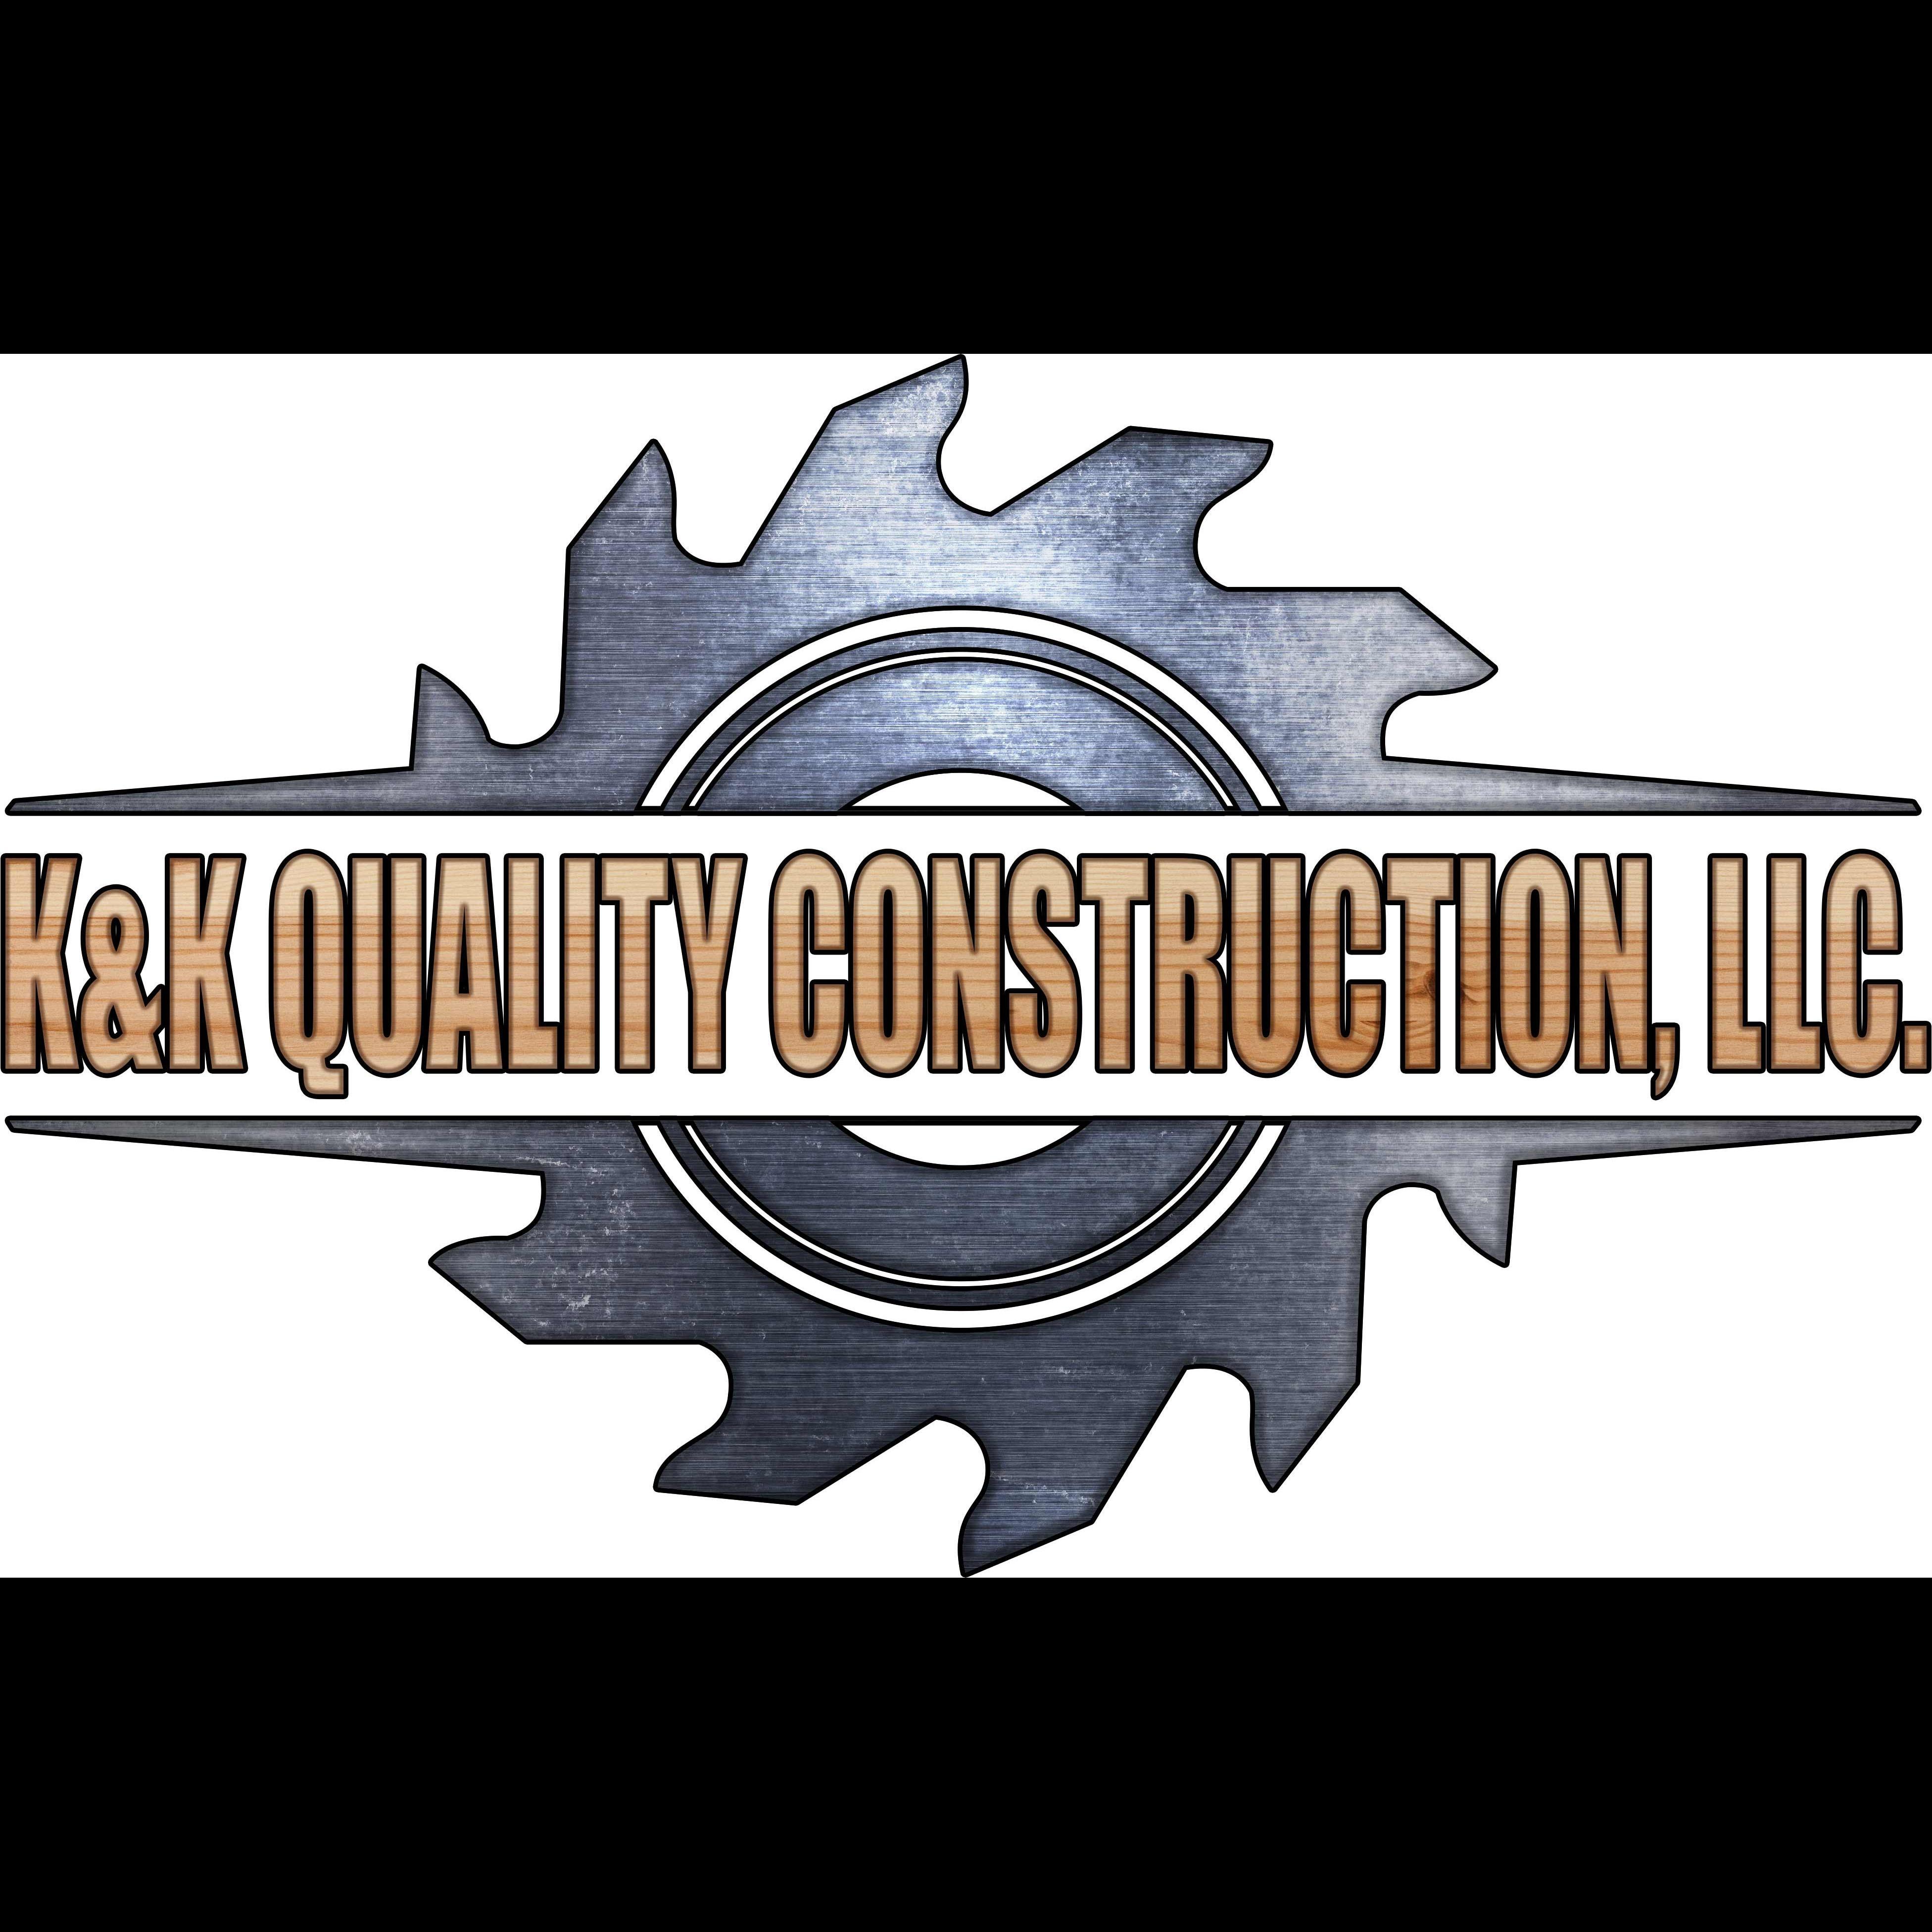 K and K Quality Construction, LLC image 0